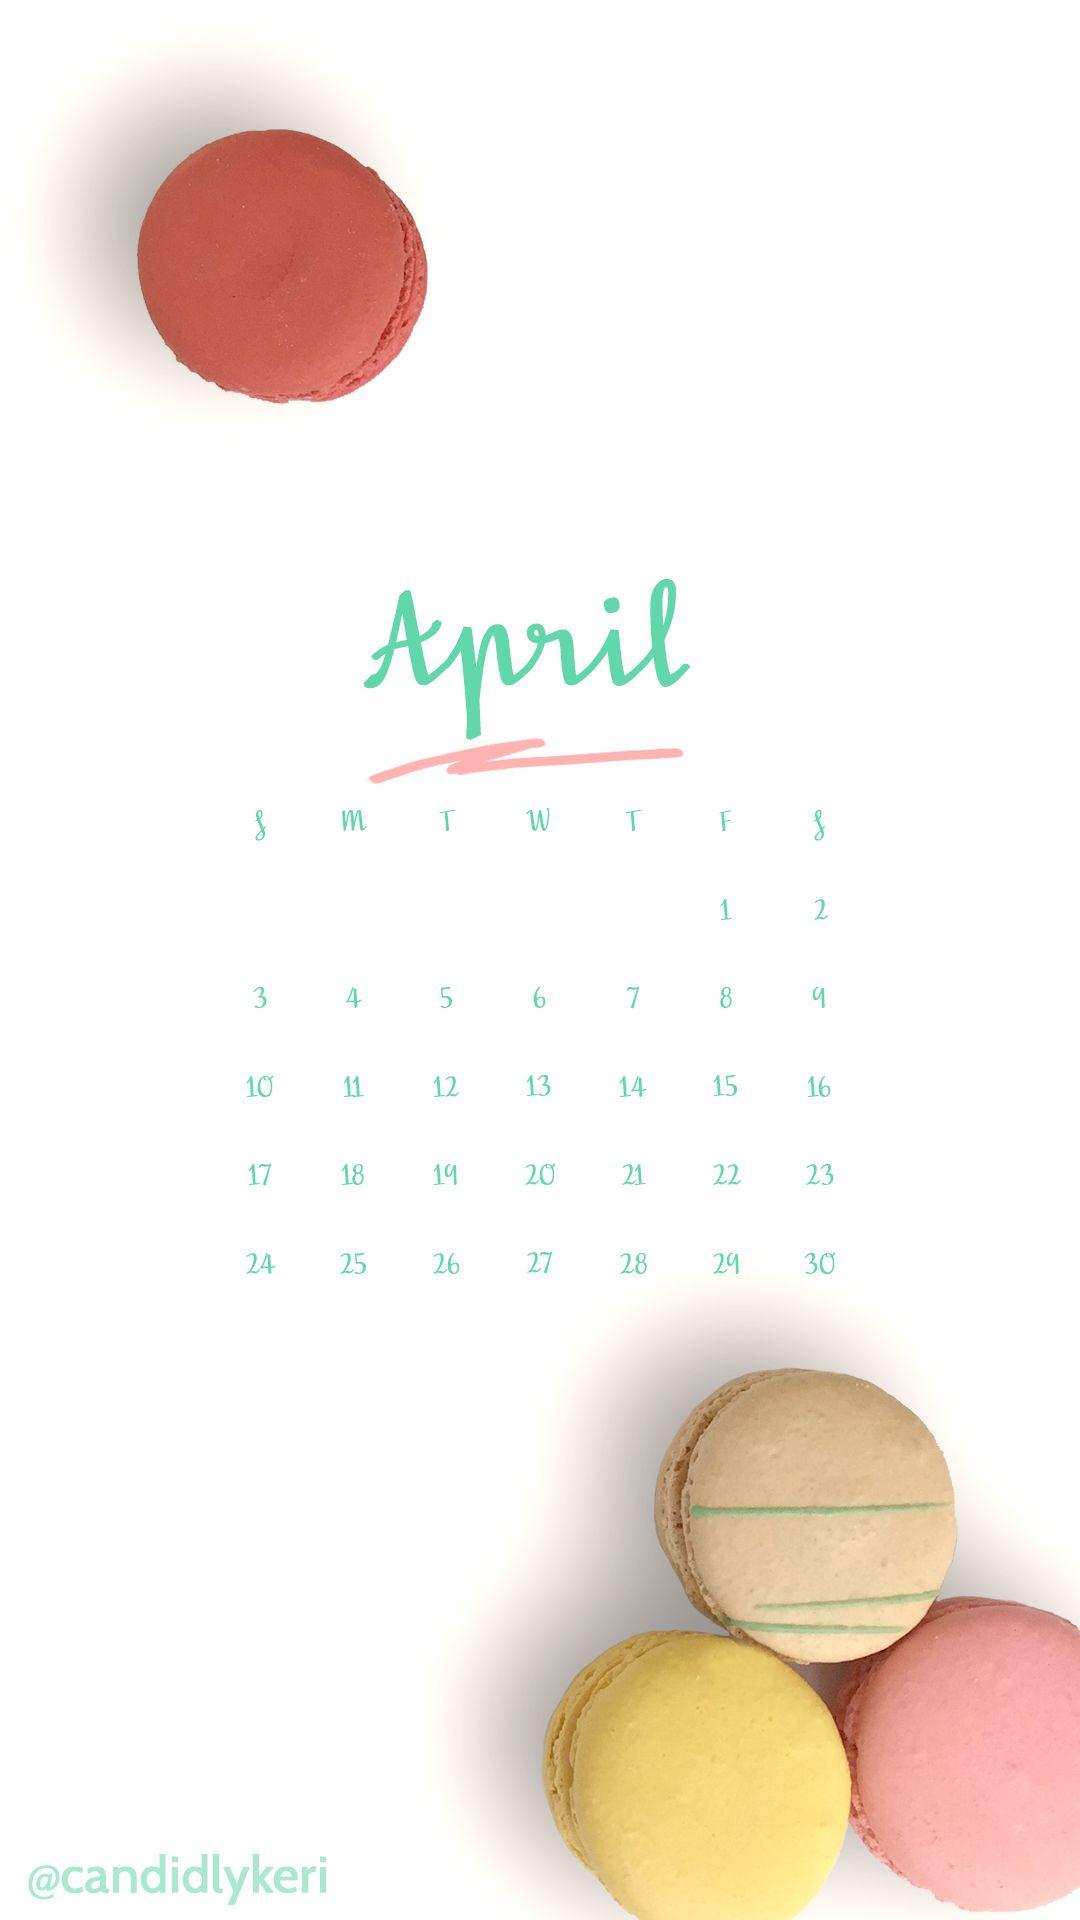 Wallpaper download blog - Free April Calendar Wallpaper Download For Free On The Blog Pastels Pinks Yellows